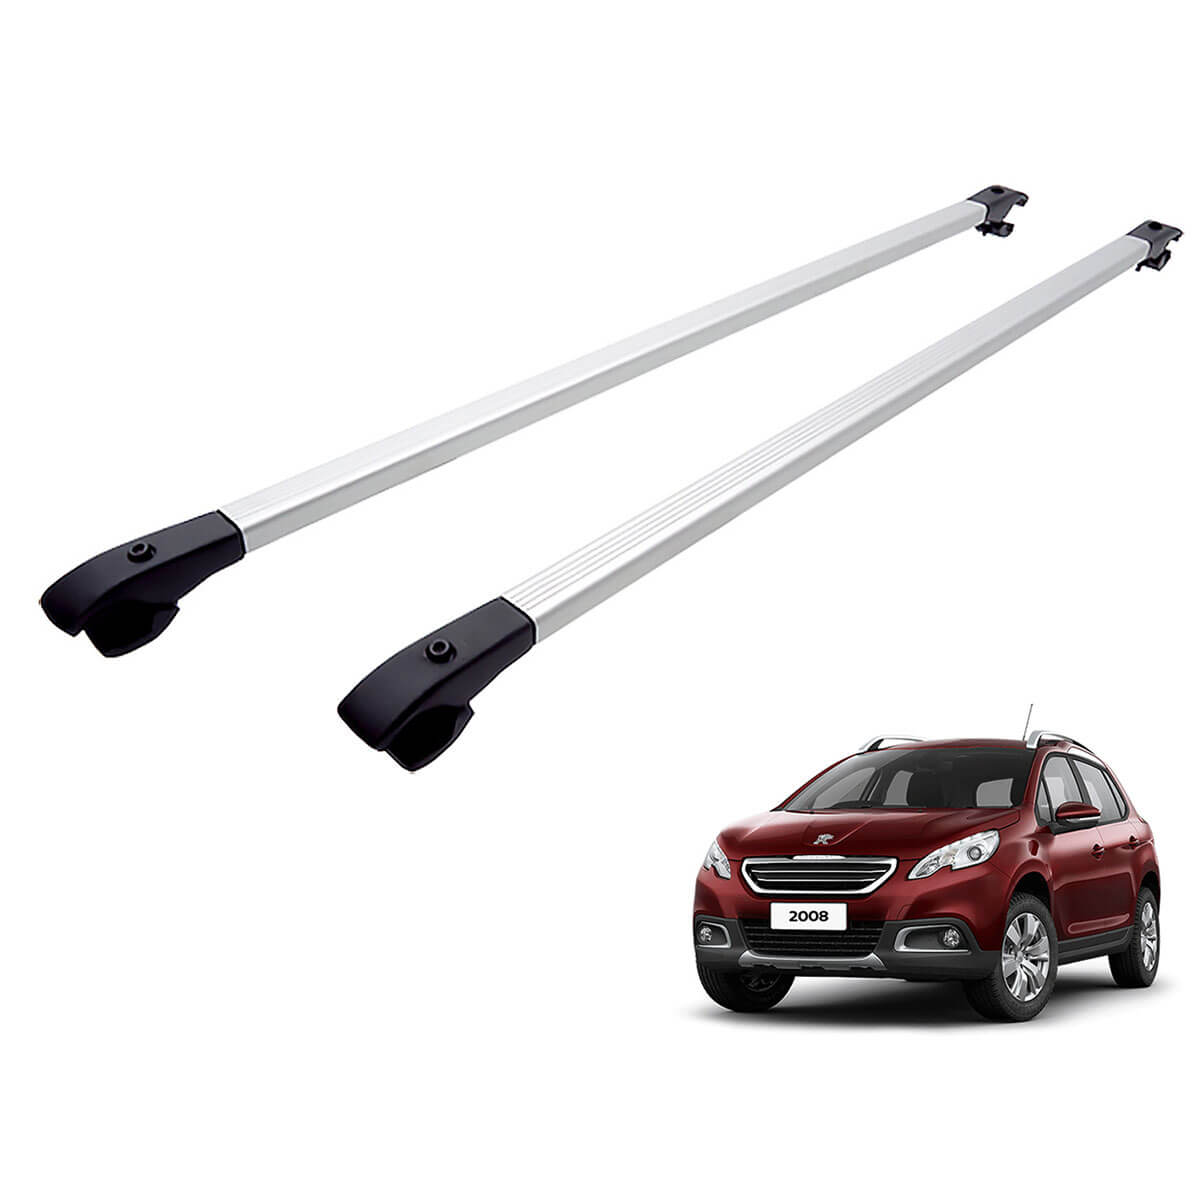 Travessa rack de teto alumínio Peugeot 2008 modelo 2016 a 2020